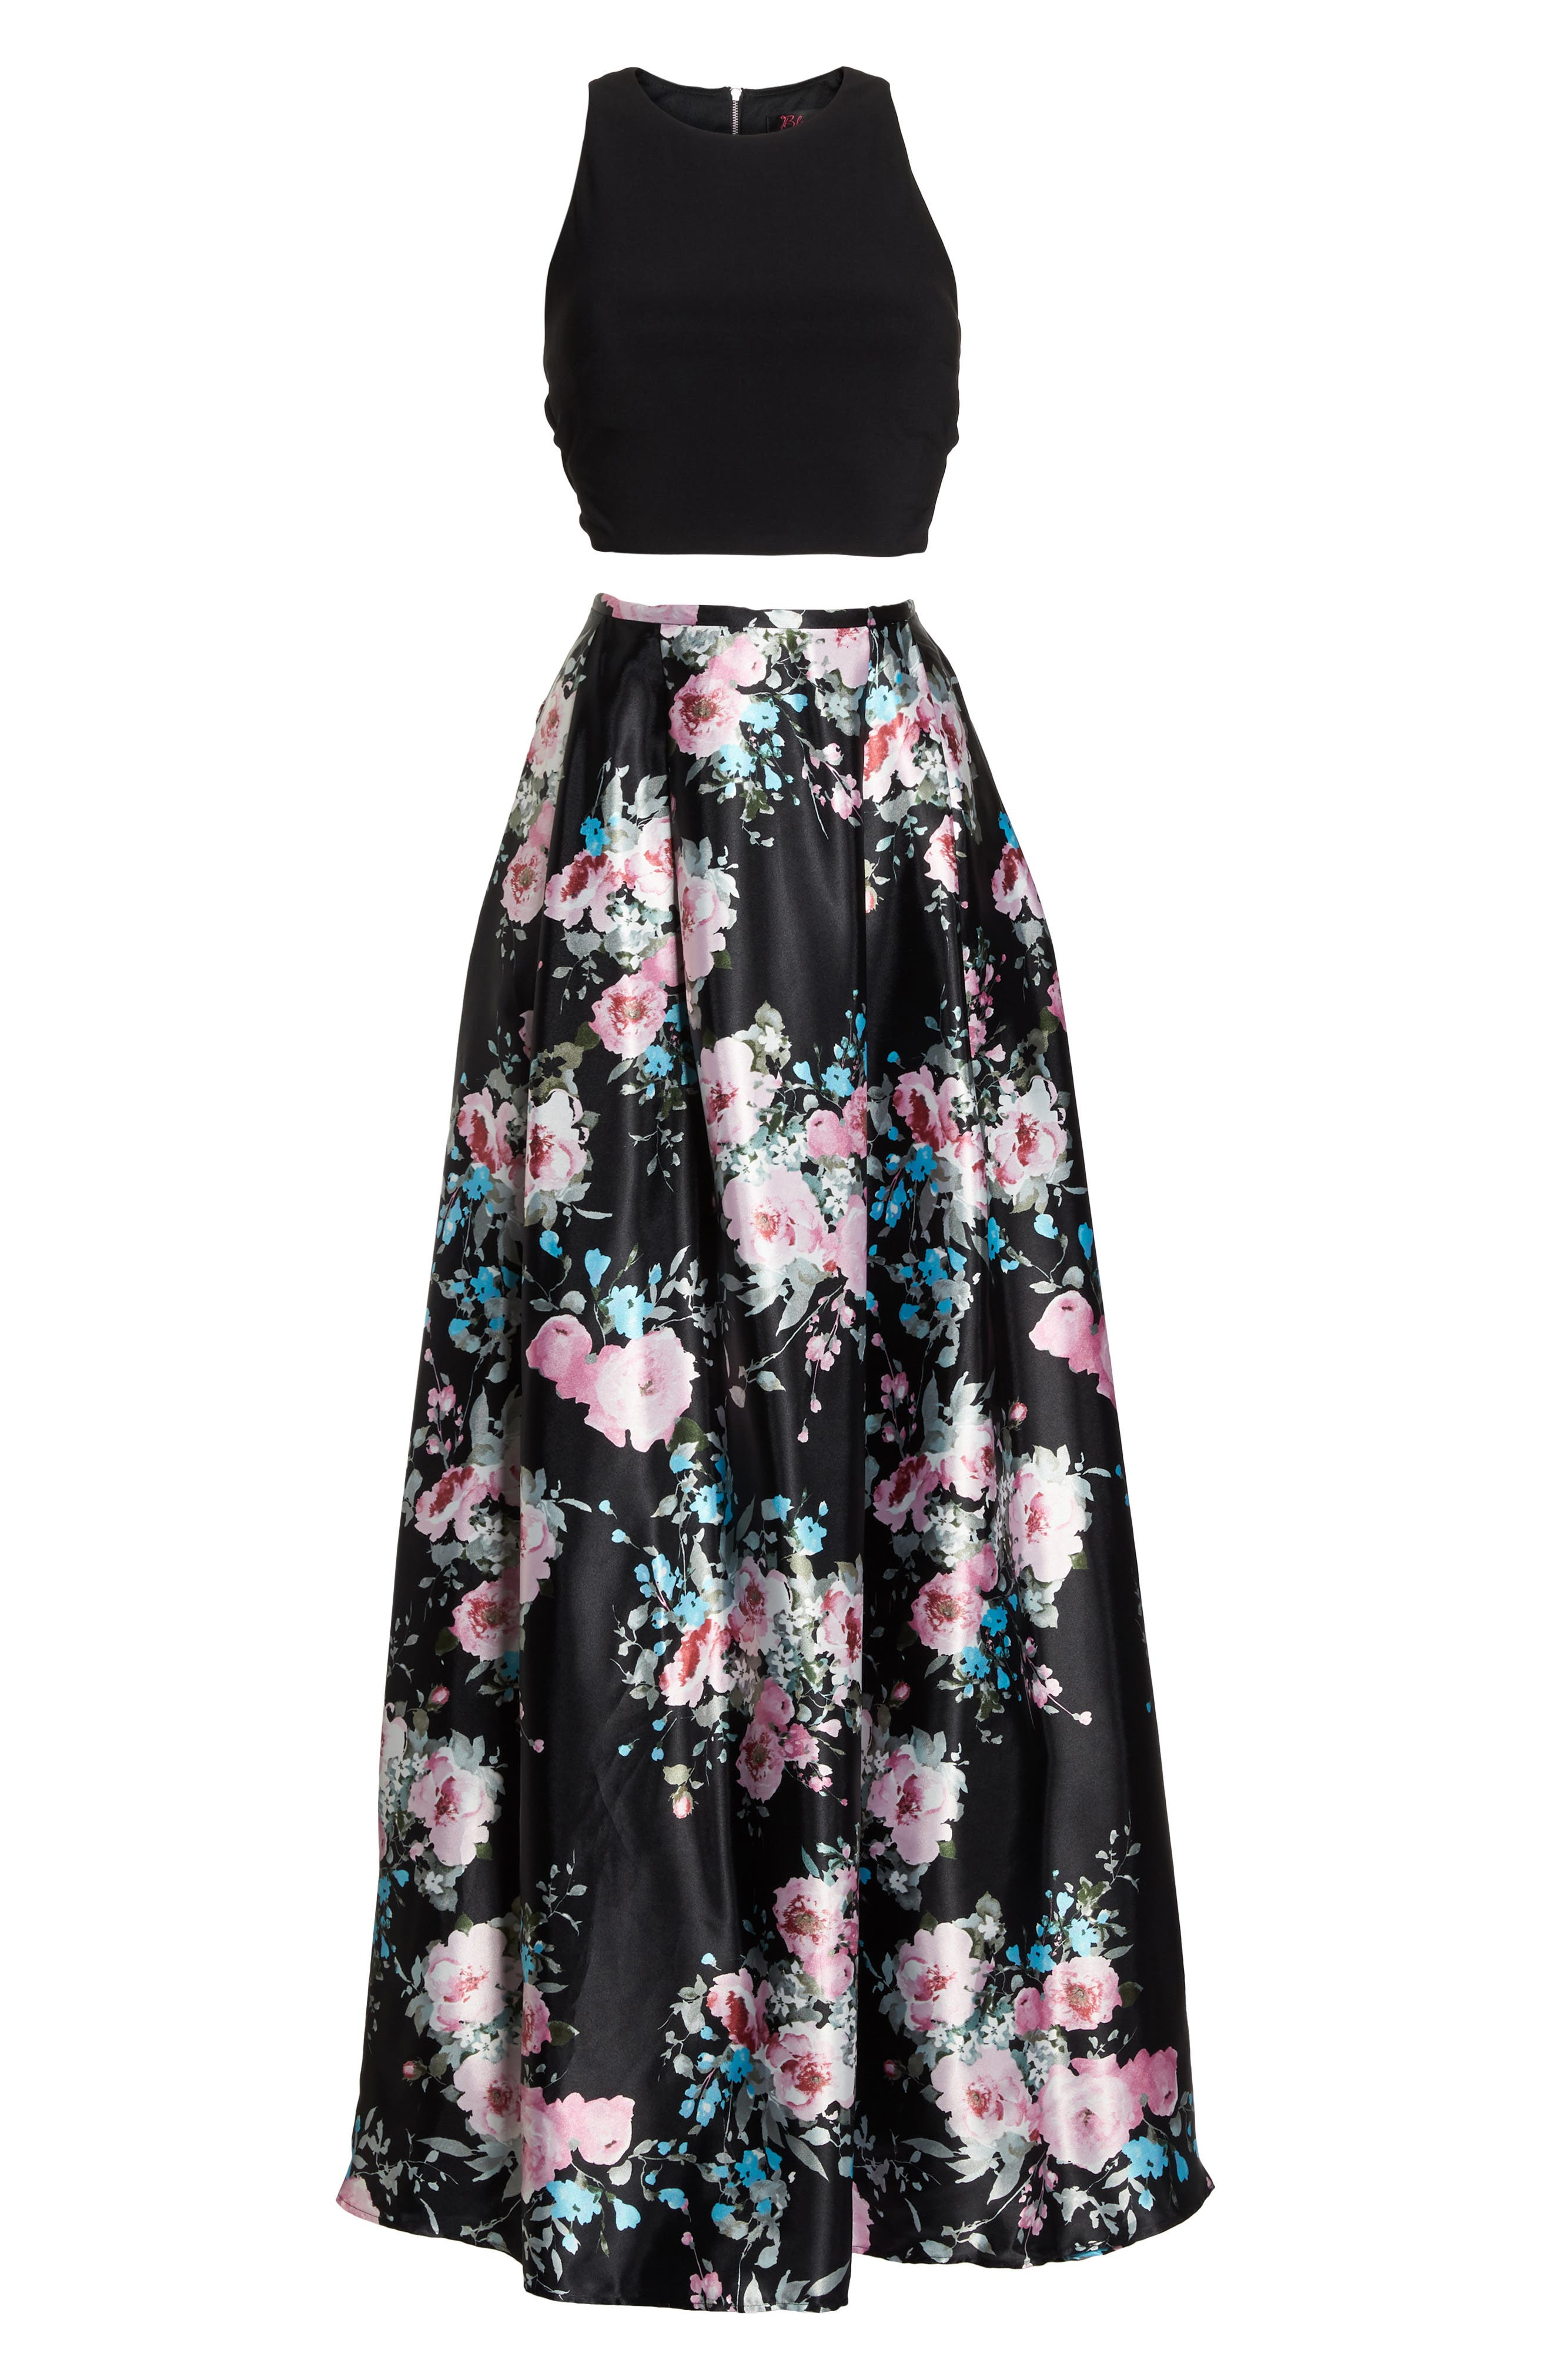 Two-Piece Ballgown,                             Alternate thumbnail 6, color,                             Black/ Floral